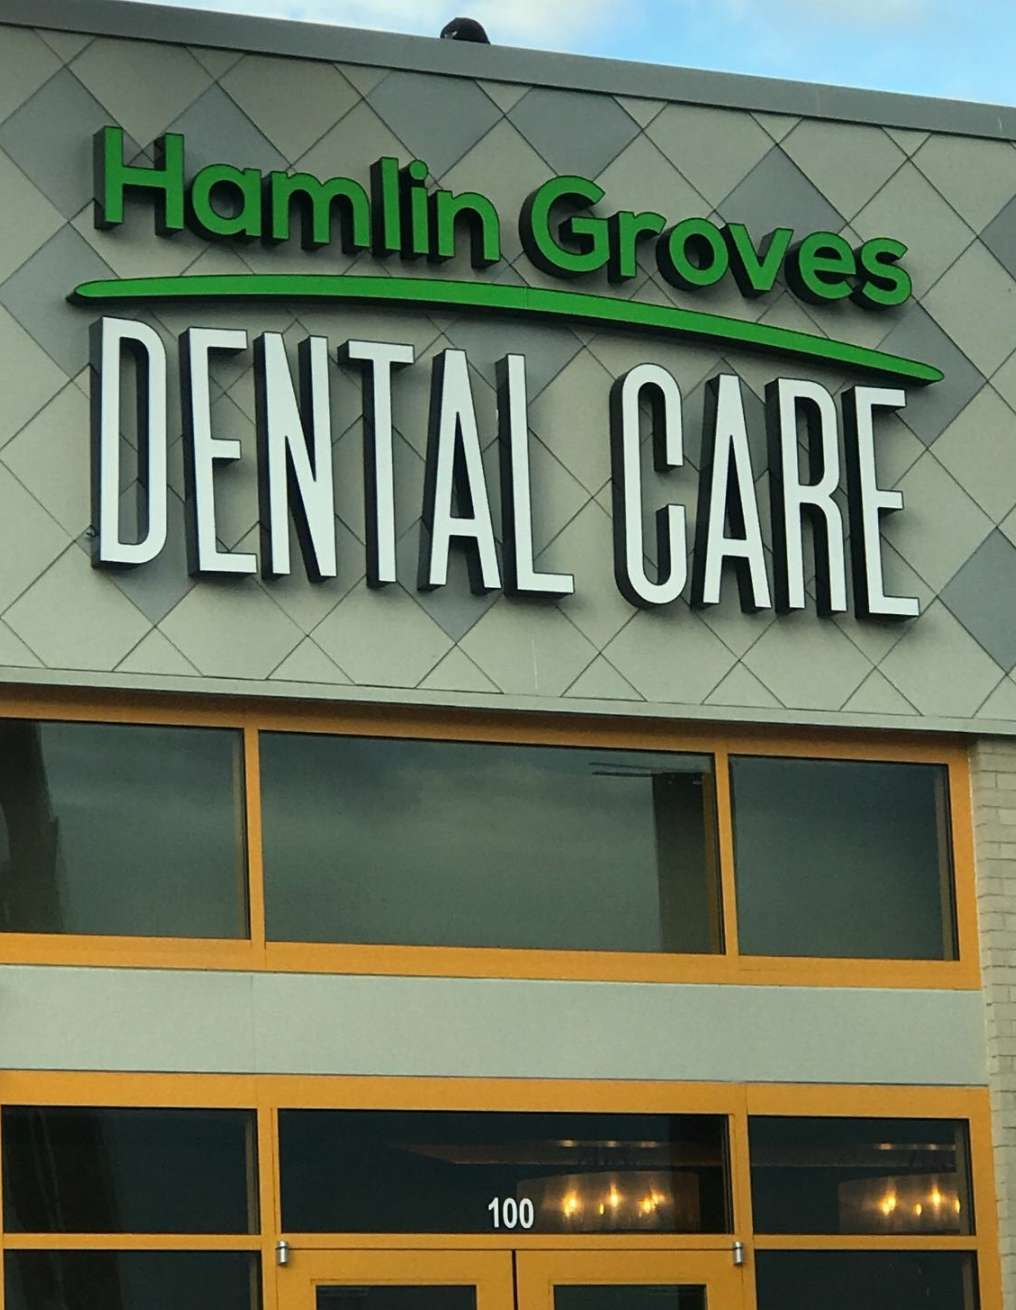 Hamlin Groves Dental Care - dentist  | Photo 7 of 10 | Address: 16412 New Independence Pkwy Ste 100, Winter Garden, FL 34787, USA | Phone: (407) 554-2335